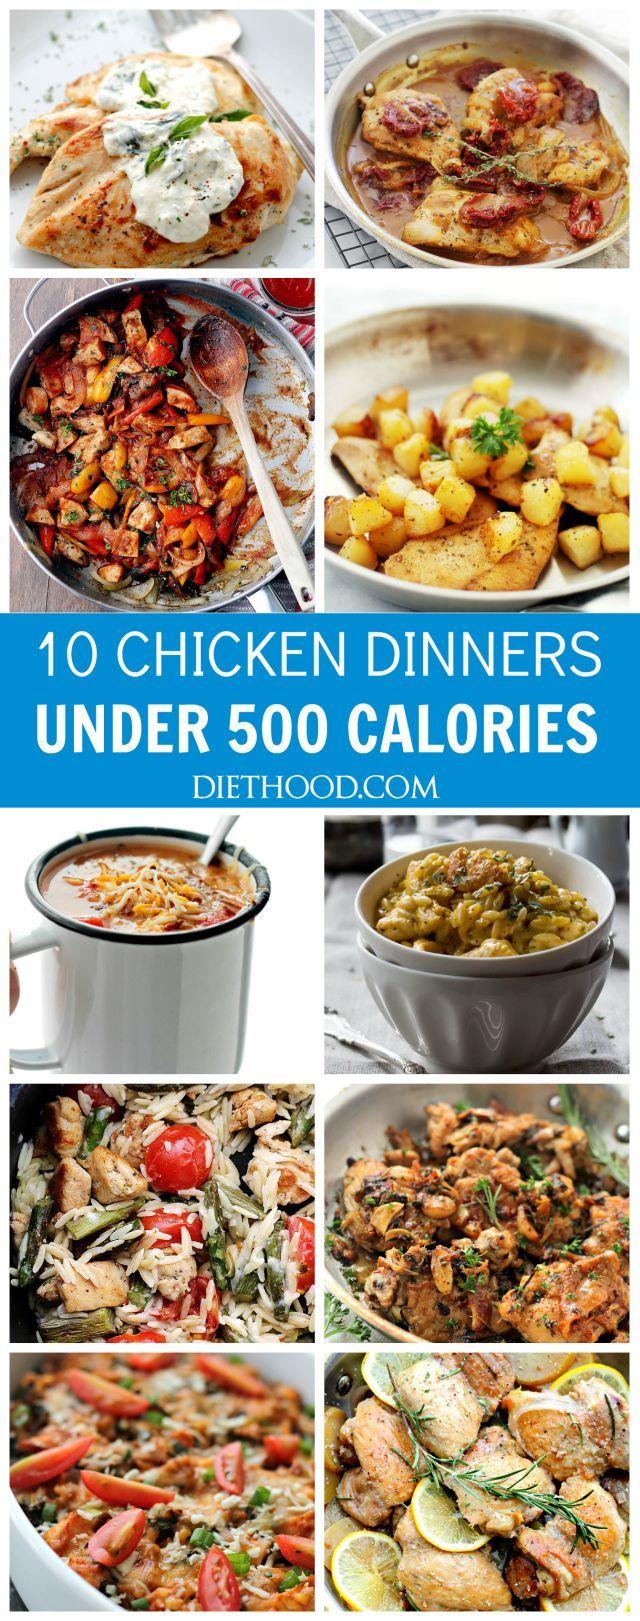 Ten Chicken Dinners Under 500 Calories Diethood Dinners Under 500 Calories Meals Under 500 Calories Healthy Eating